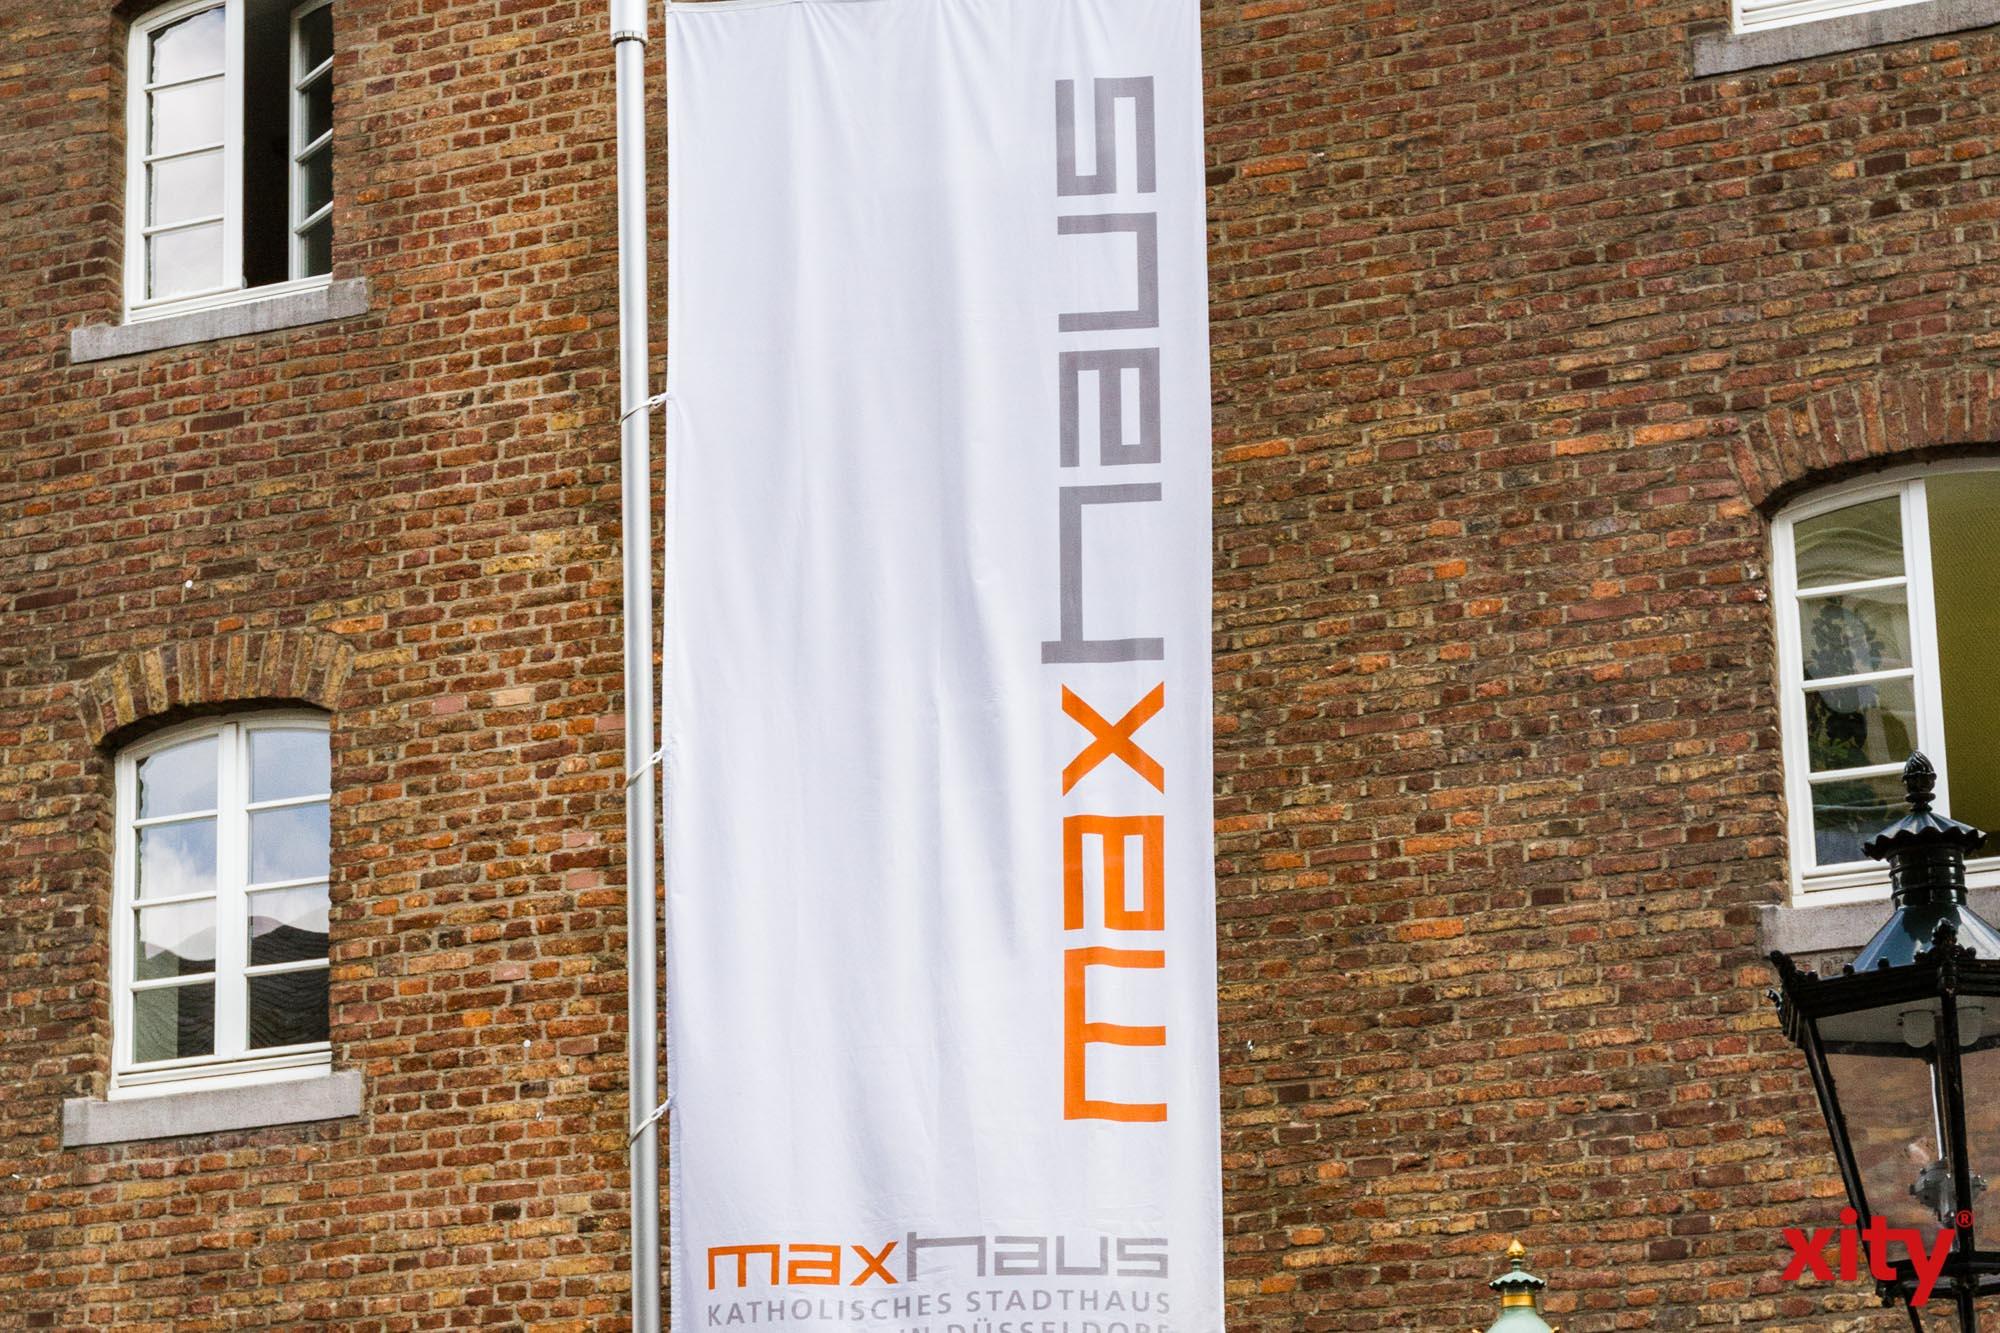 Programm des Maxhaus Düsseldorf im Juni 2021 (Foto: xity)